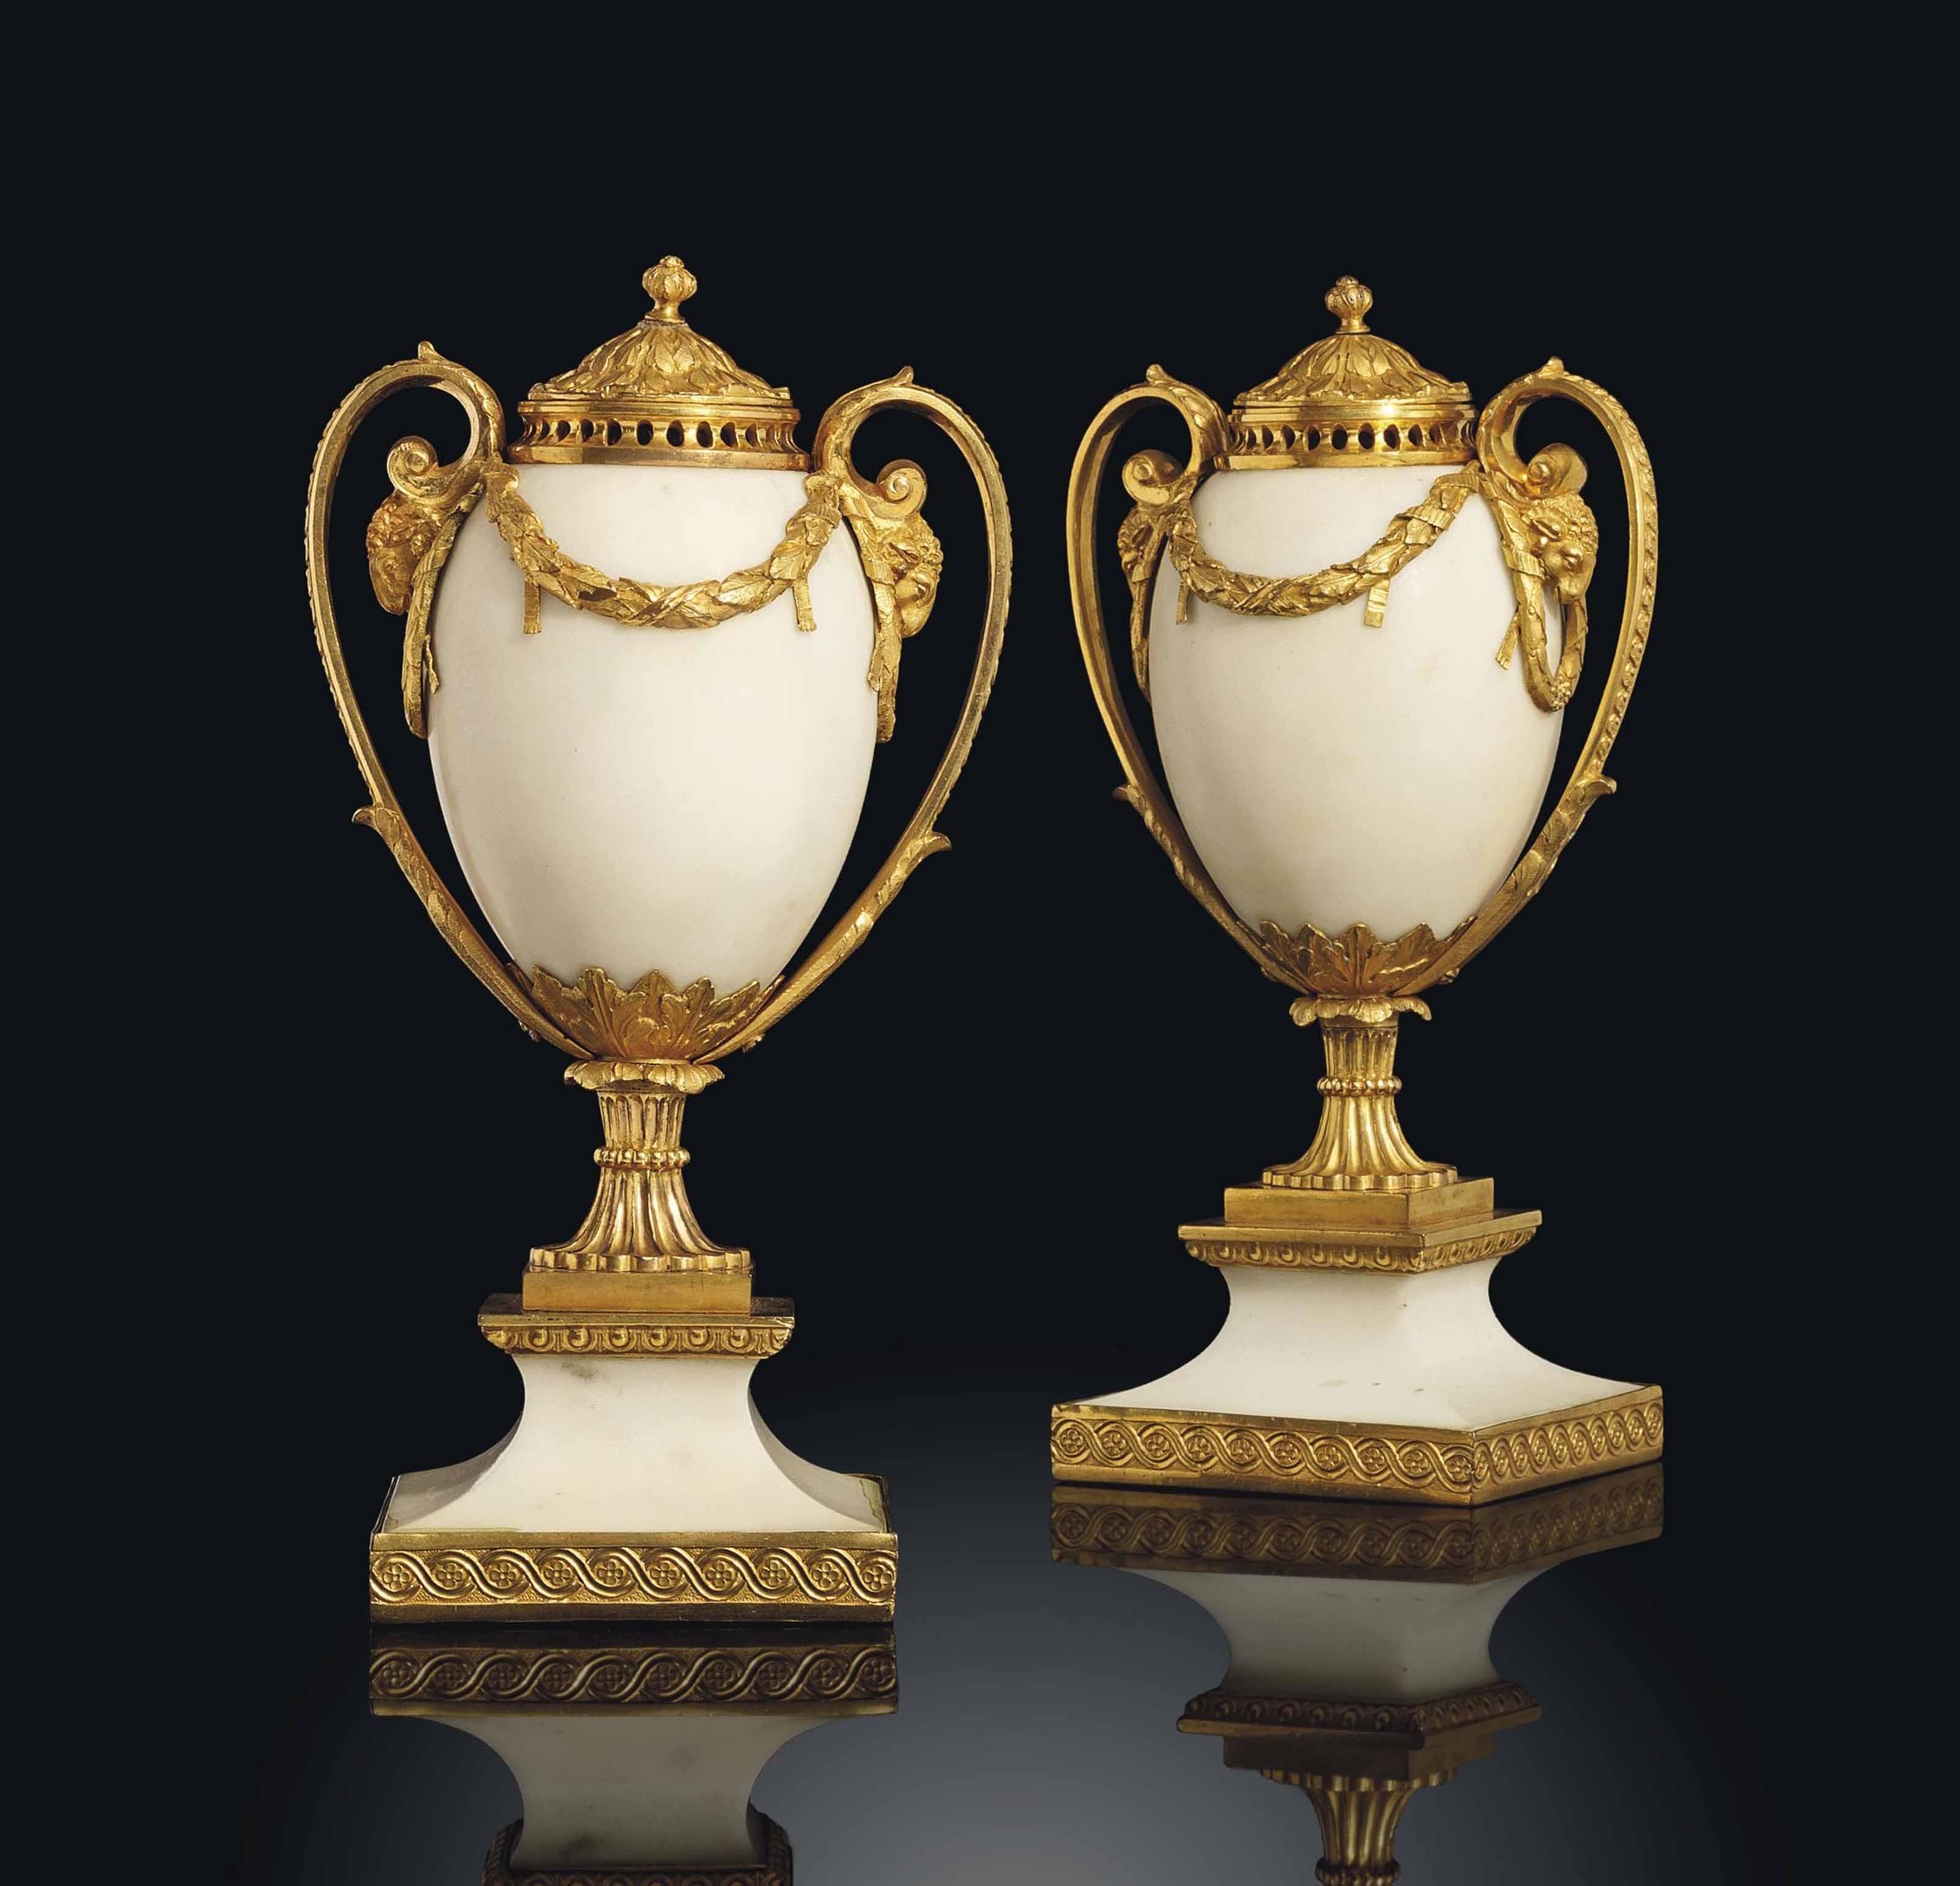 A PAIR OF GEORGE III ORMOLU AND WHITE MARBLE PERFUME-BURNERS